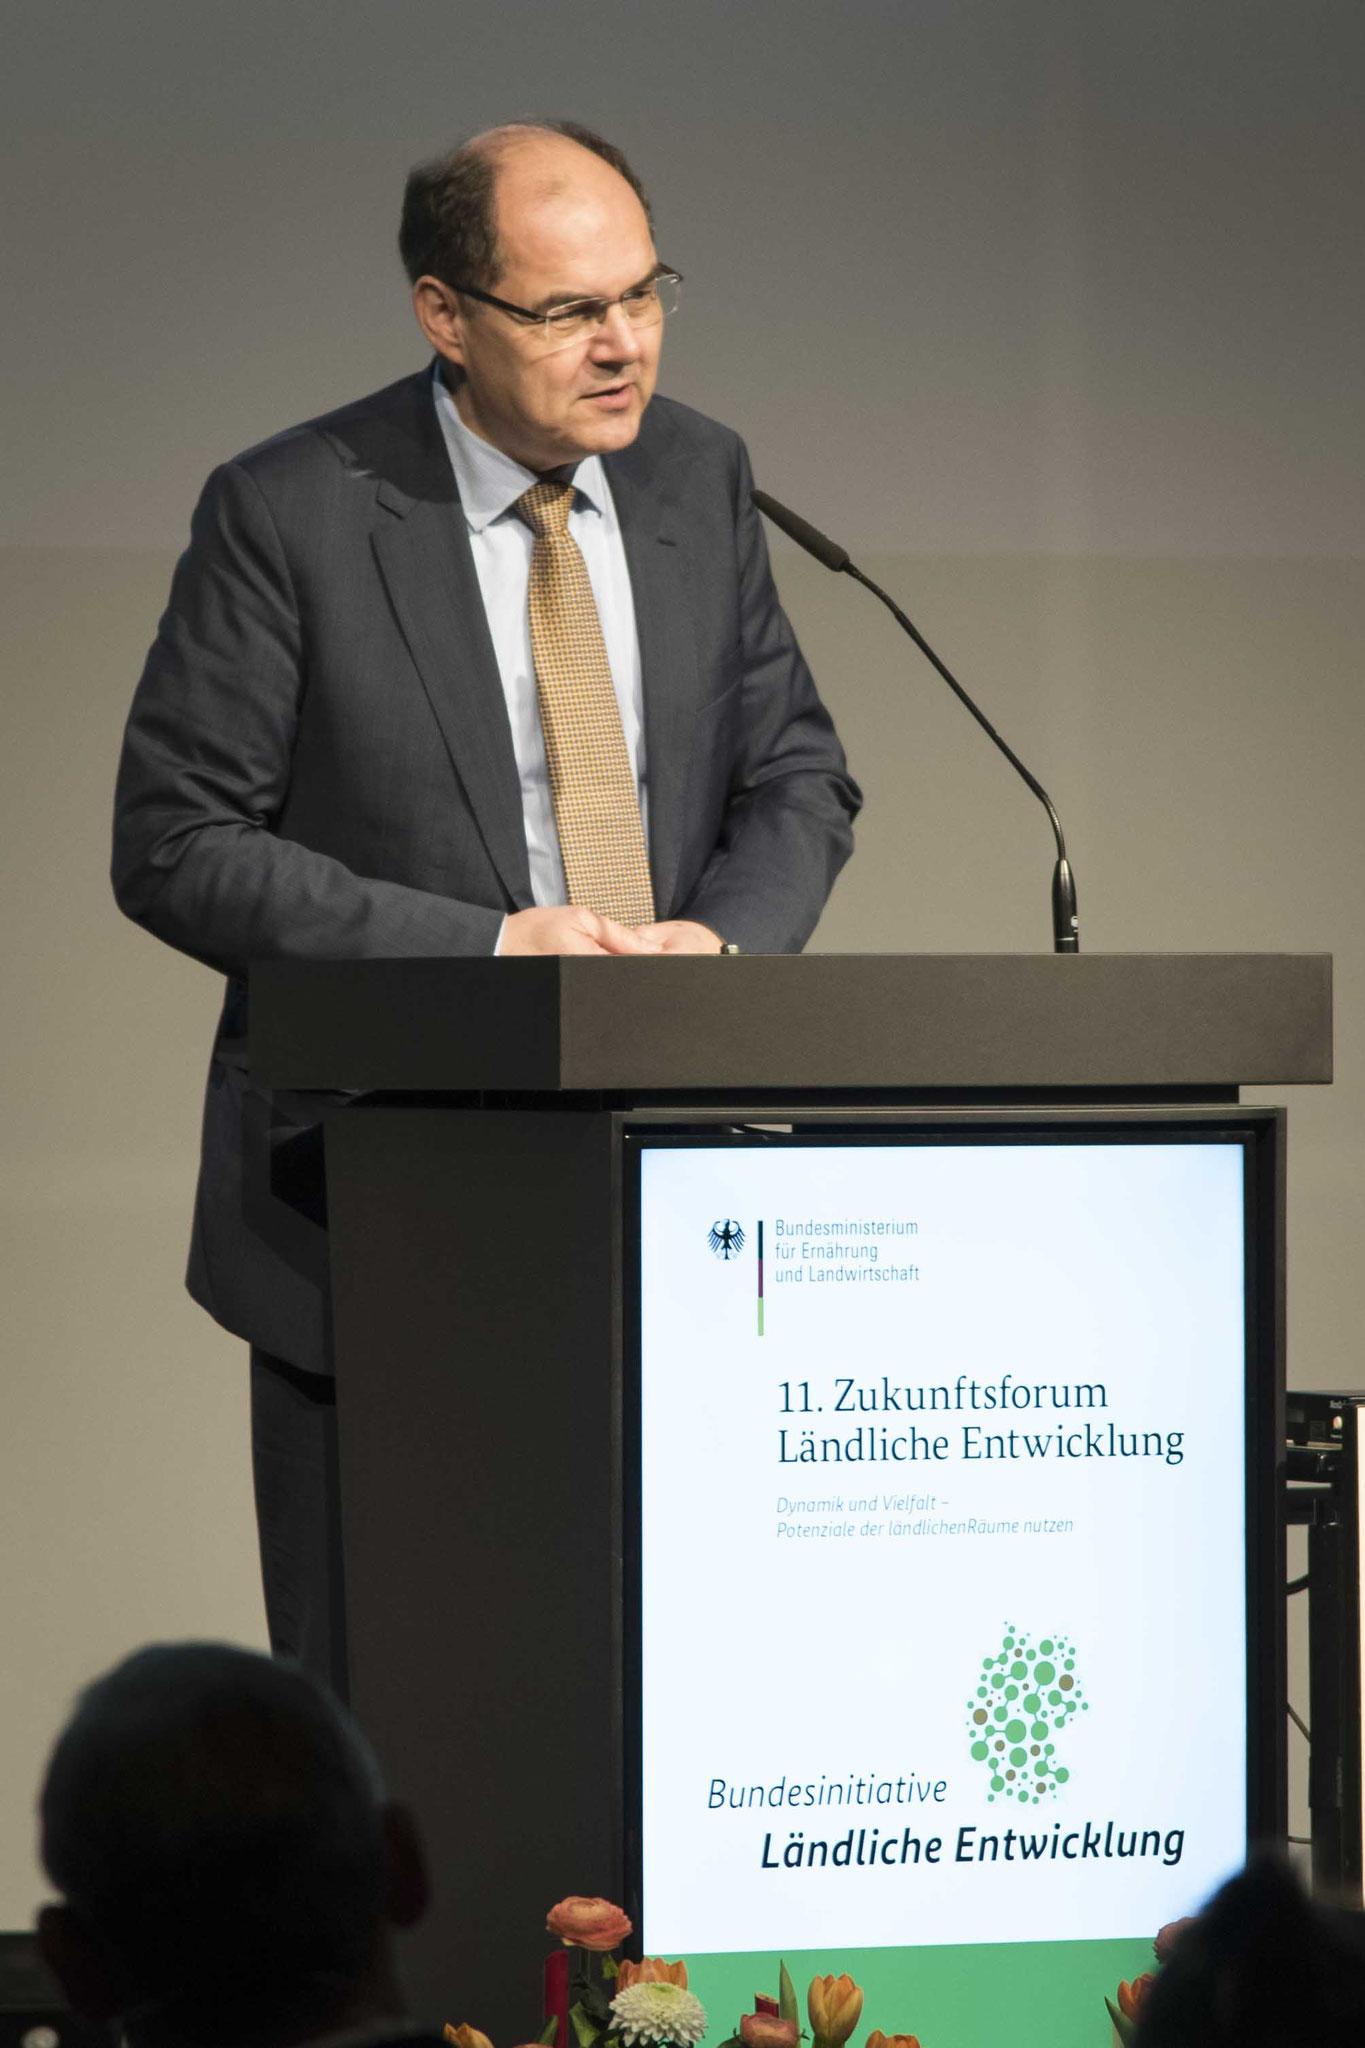 Eröffnung des Zukunftsforums durch Mininster Christian Schmidt